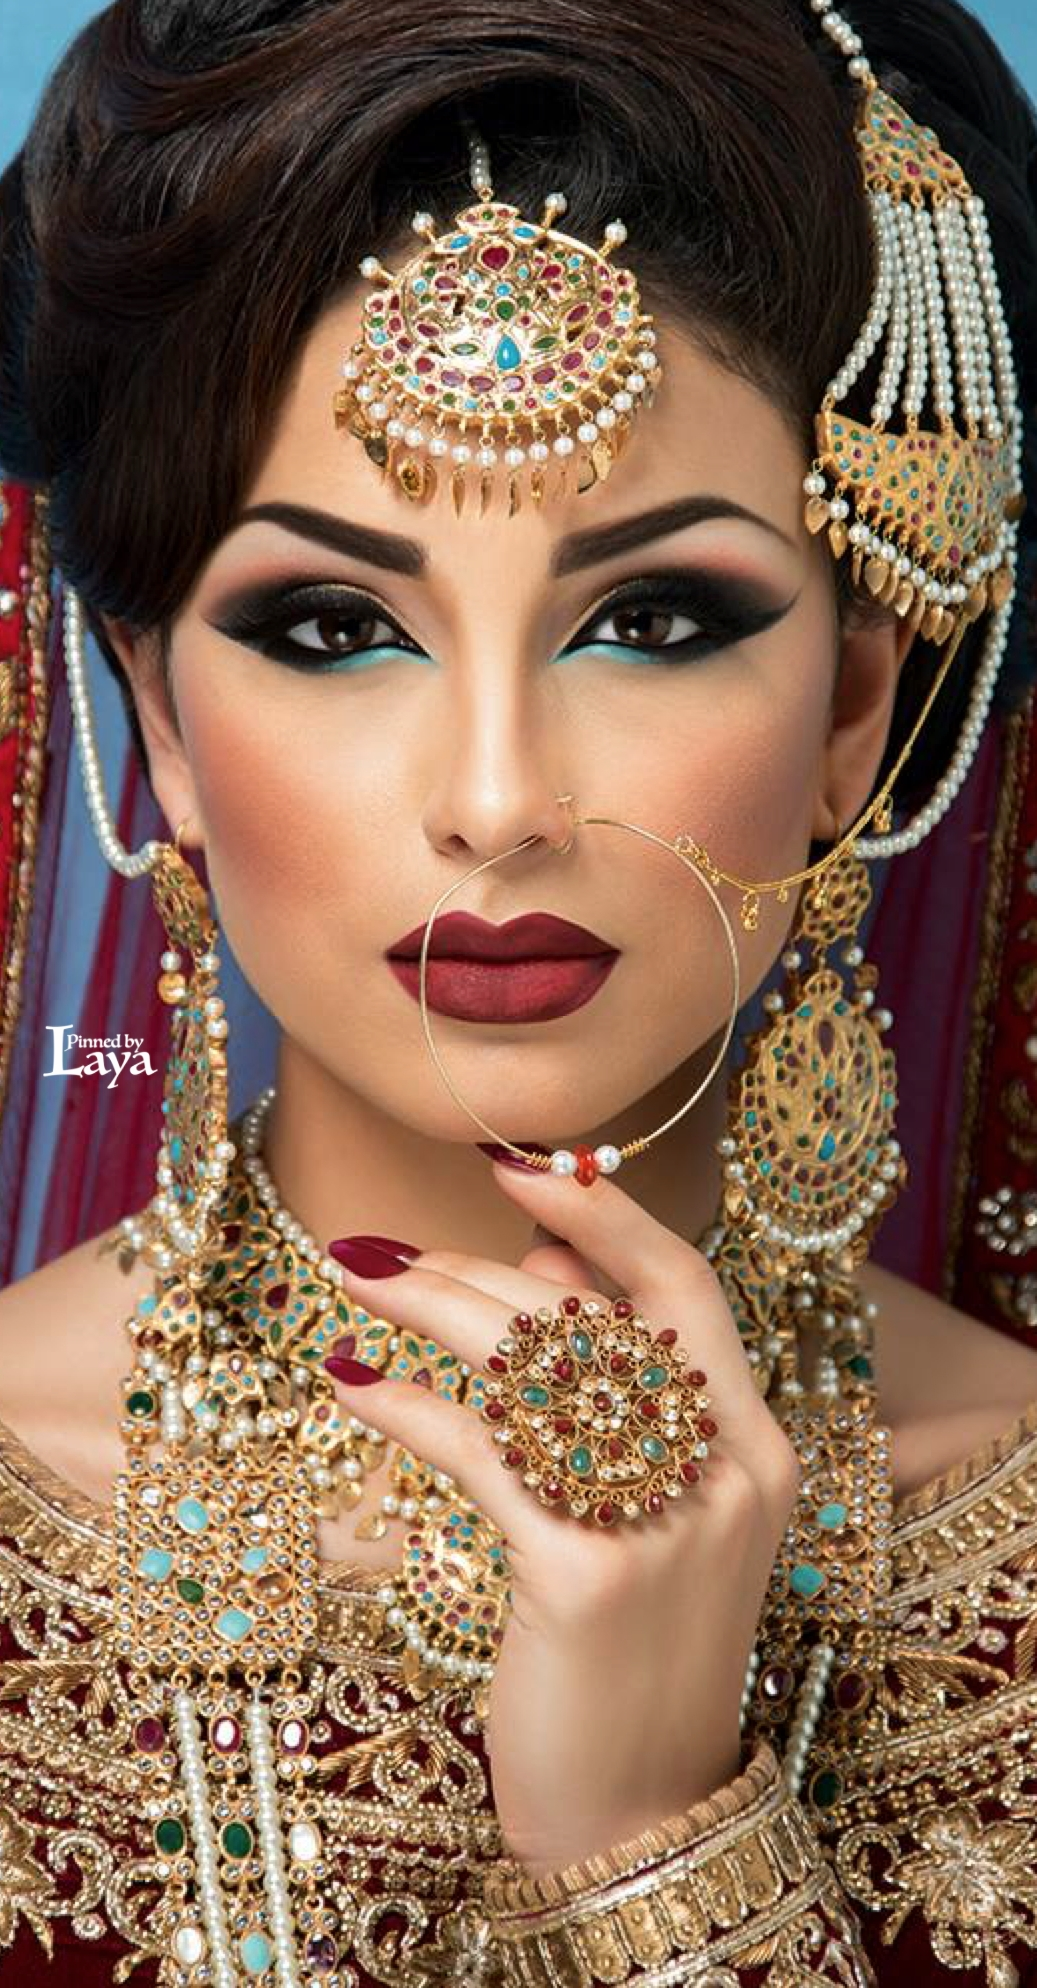 Pin By Label Shrena Hirawat On Beauty, Hair, Makeup   Pinterest with Bridal Makeup Pic Facebook